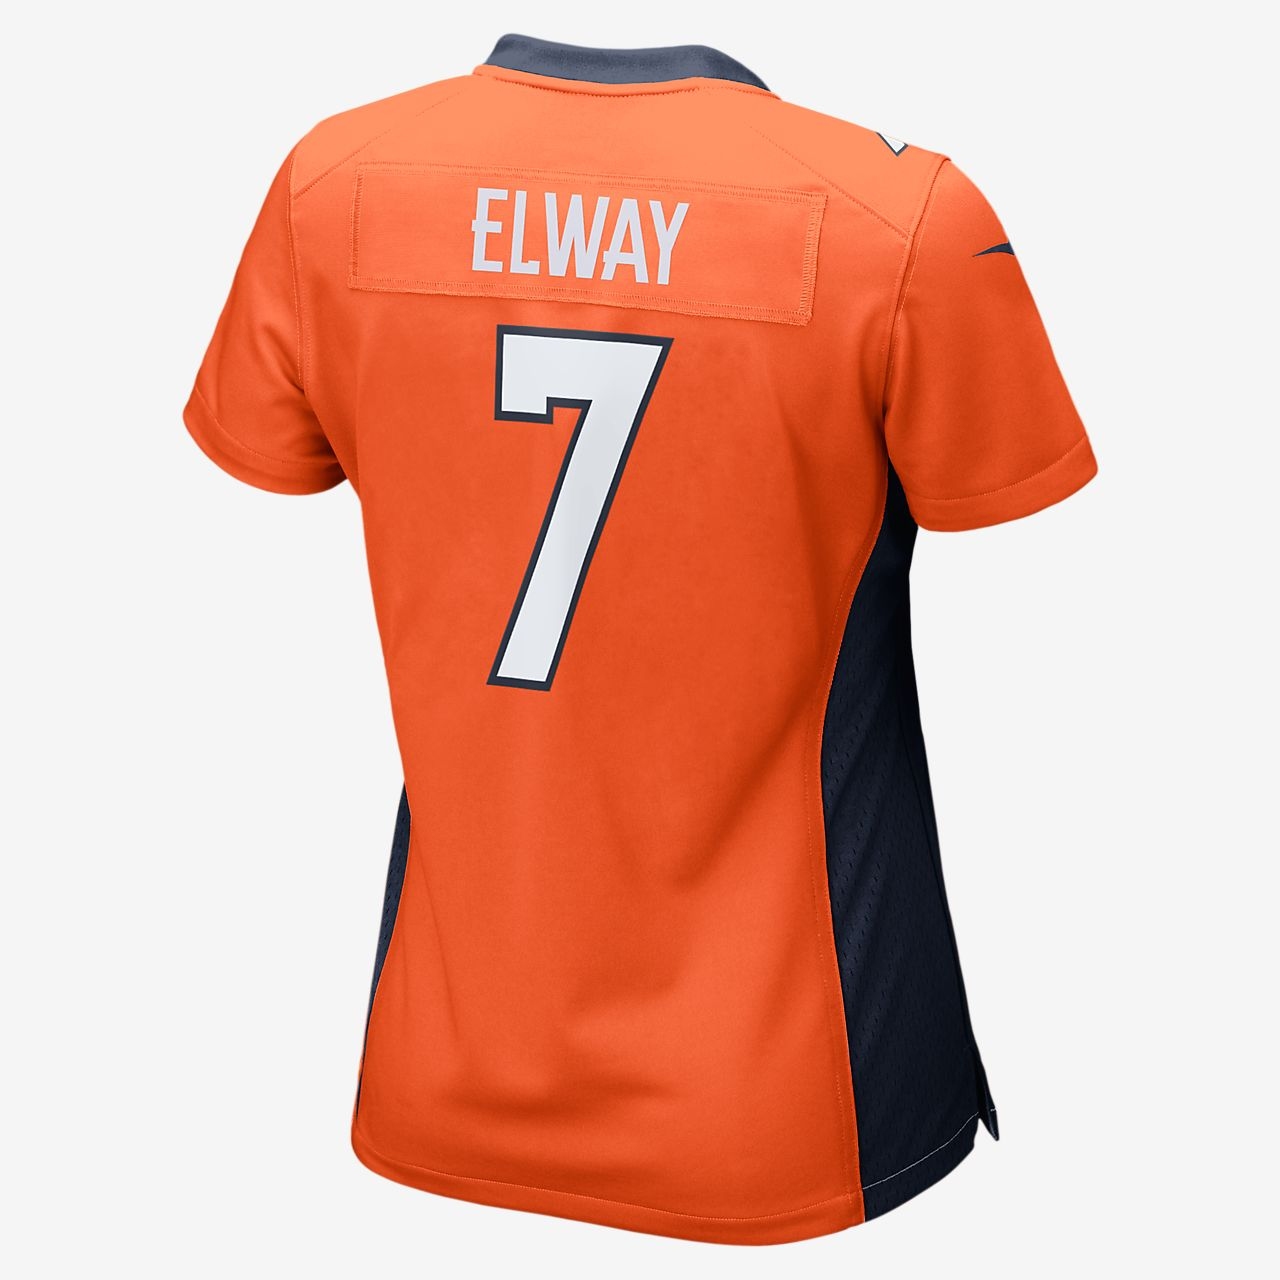 56e347c812dd8 ... NFL Denver Broncos (John Elway) Women's Football Home Game Jersey